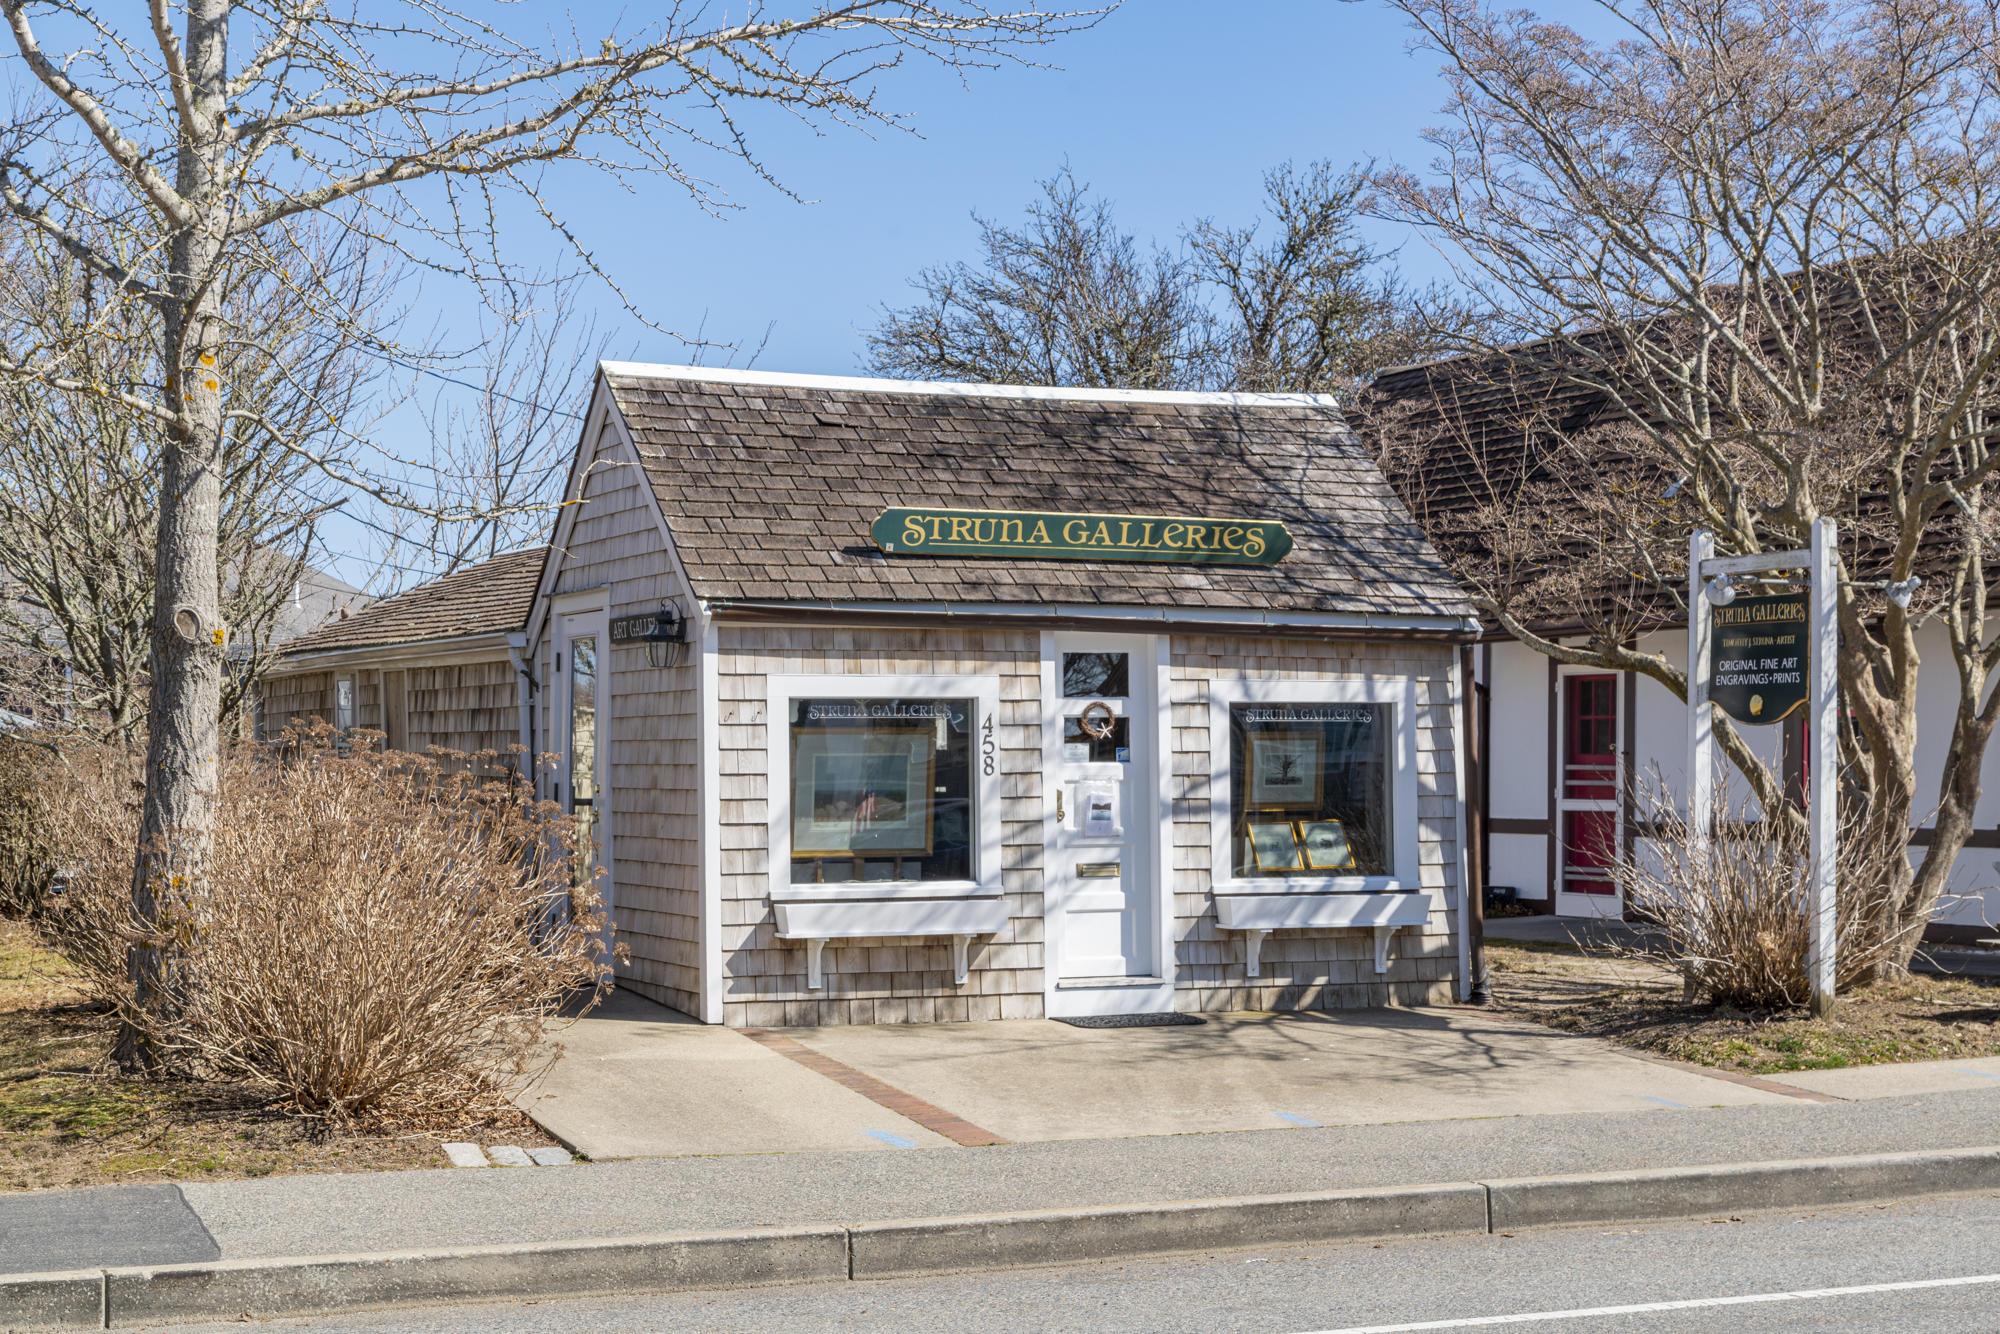 456 Main Street, Chatham, MA  02633 - slide 3